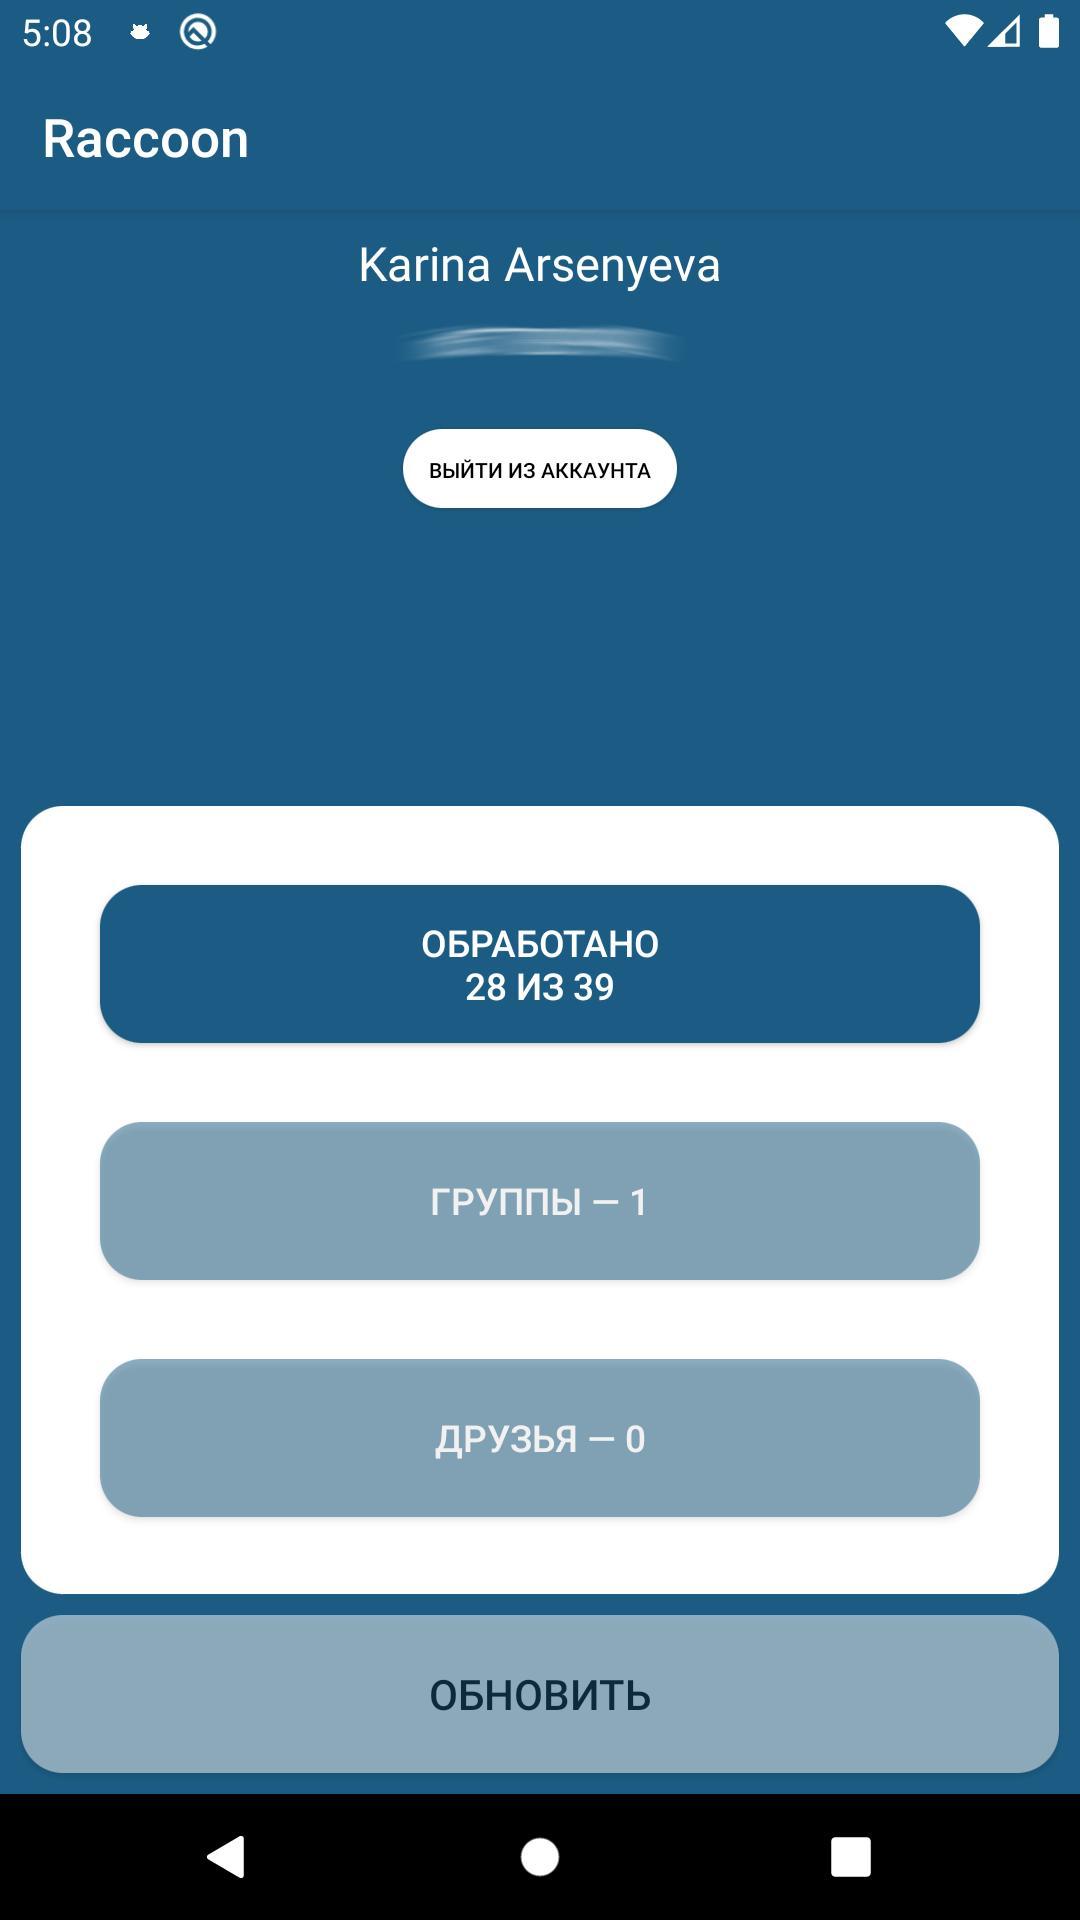 raccoon apk downloader на русском